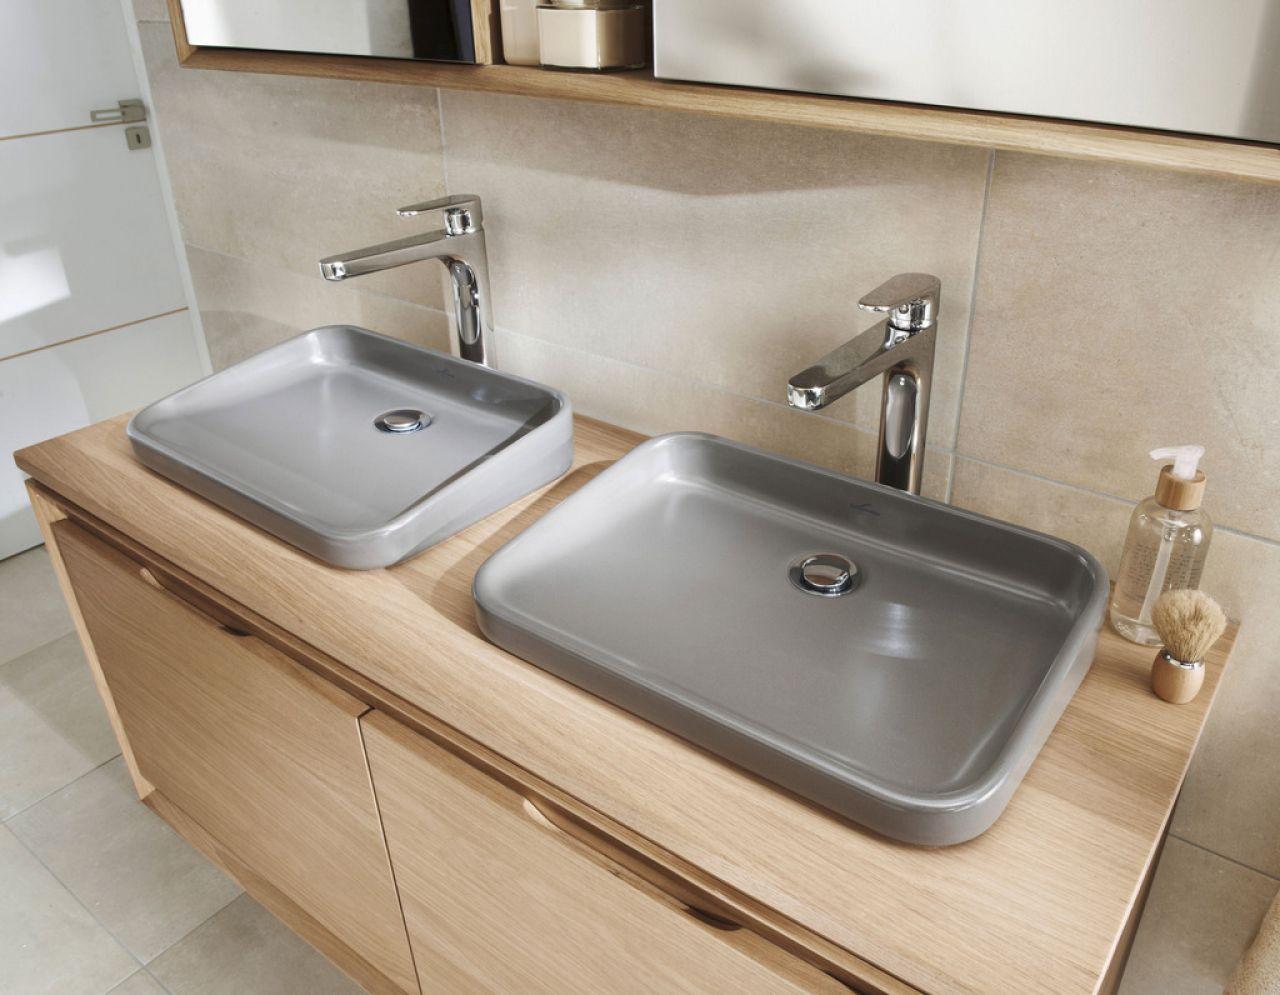 Vasque rio gr s sepia poser merignac 33701 for Destockage salle de bain